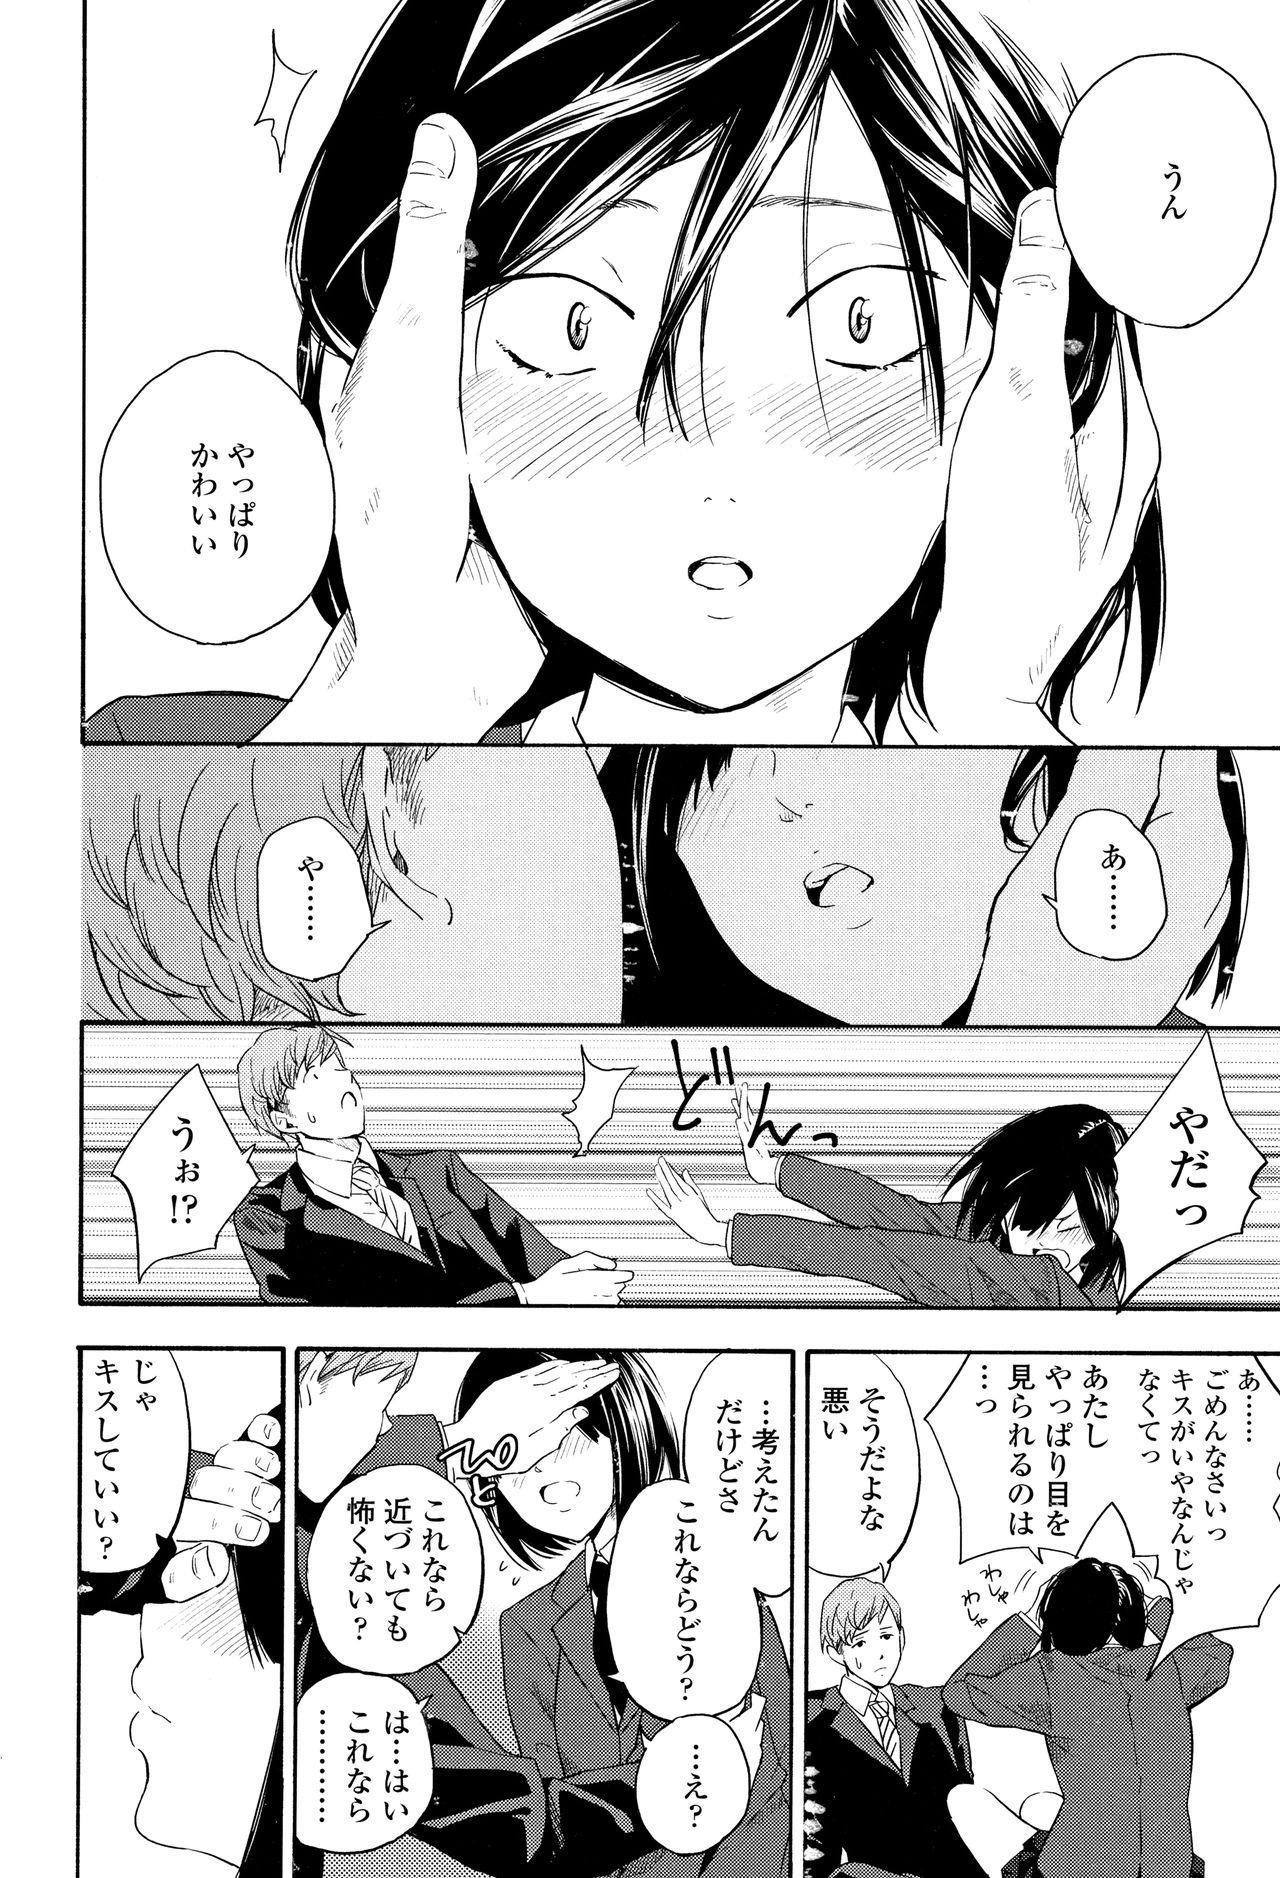 Shishunki no Eros - puberty eros 8